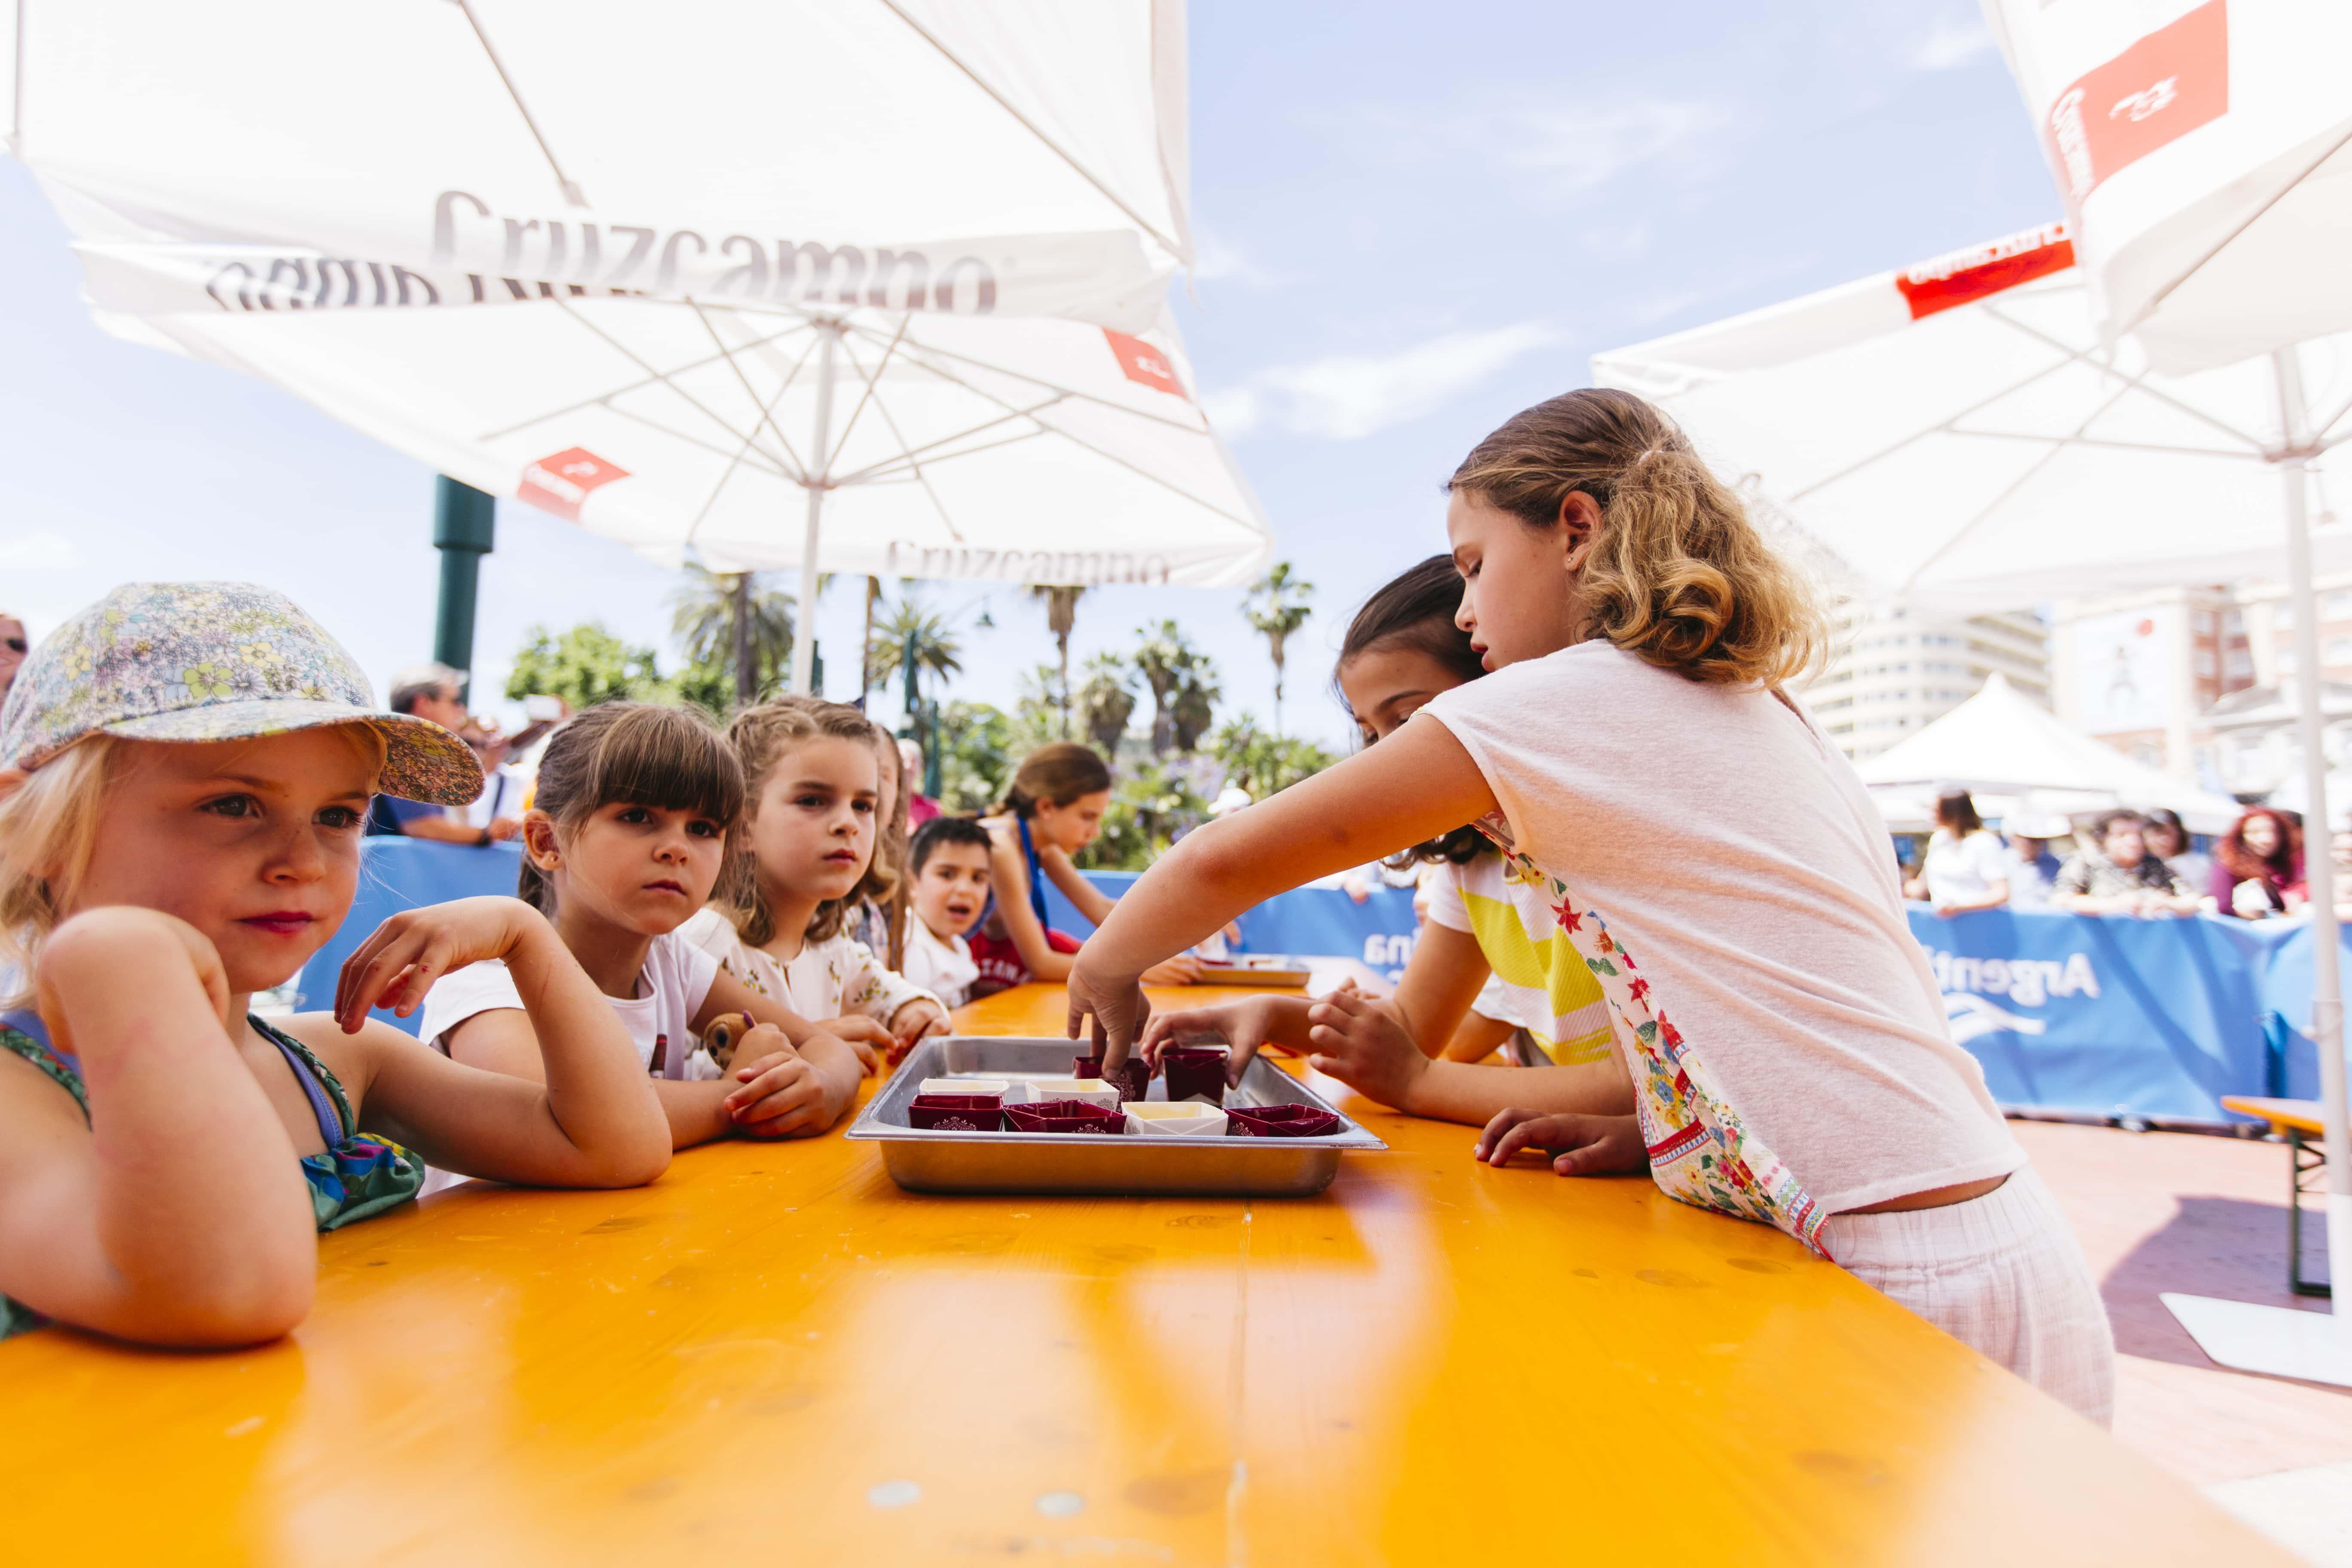 La Mesa Malaga Zwd9 La Escuela De Cocina La Mesa MÃ Laga MÃ Laga Gastronomy Festival 2018